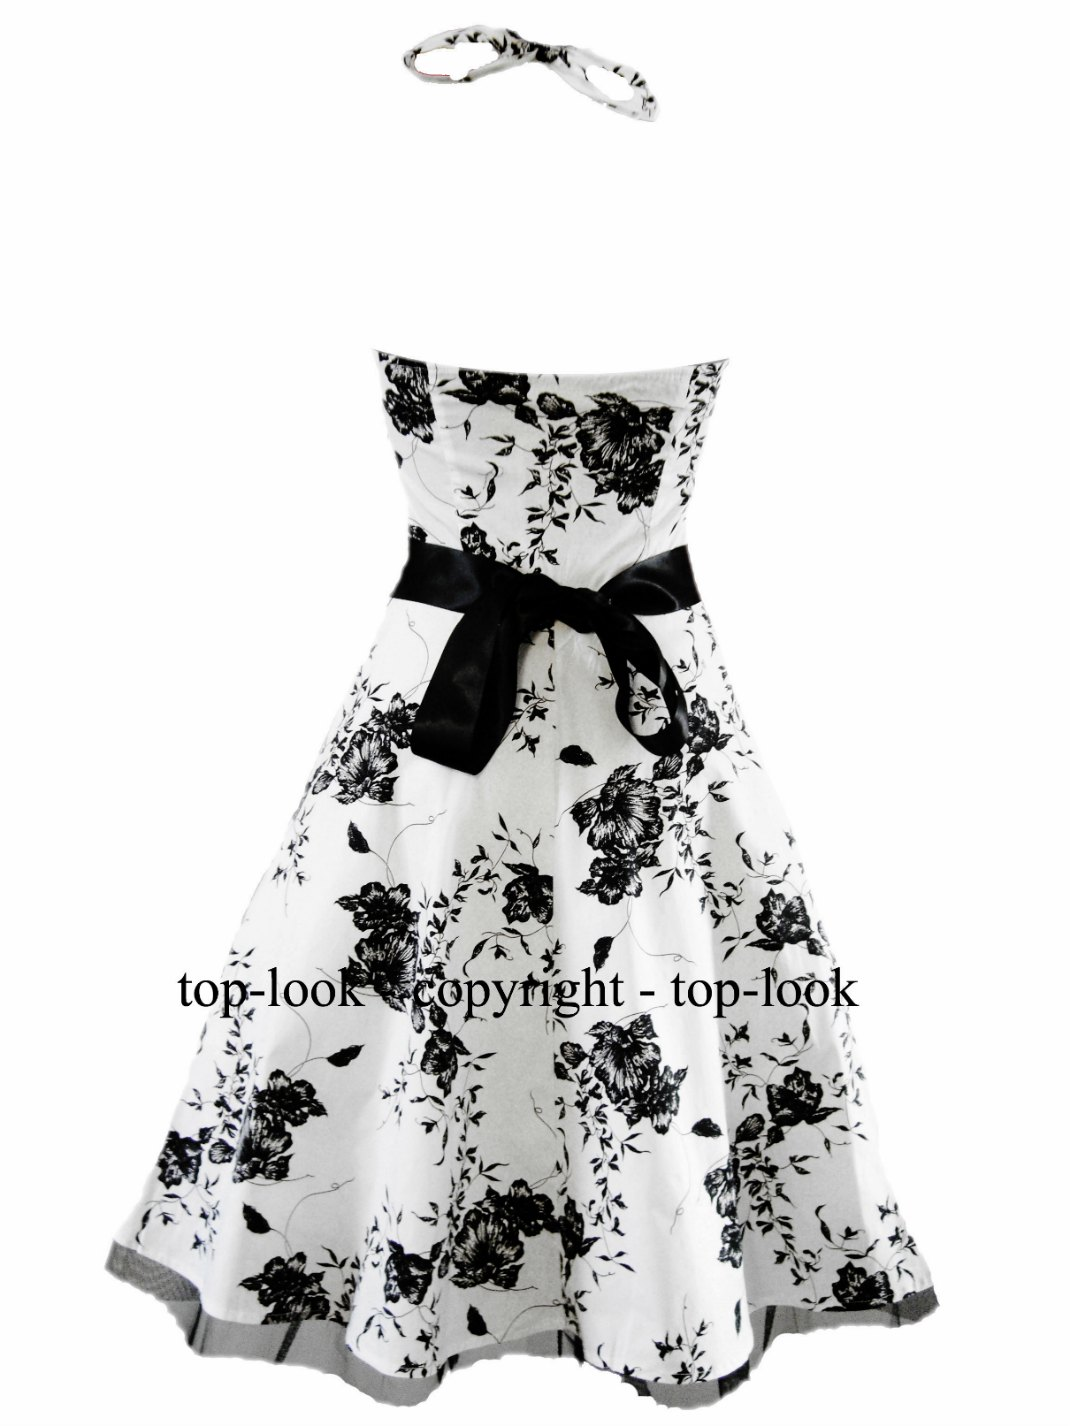 Reverse - Black & White Version Illustrated